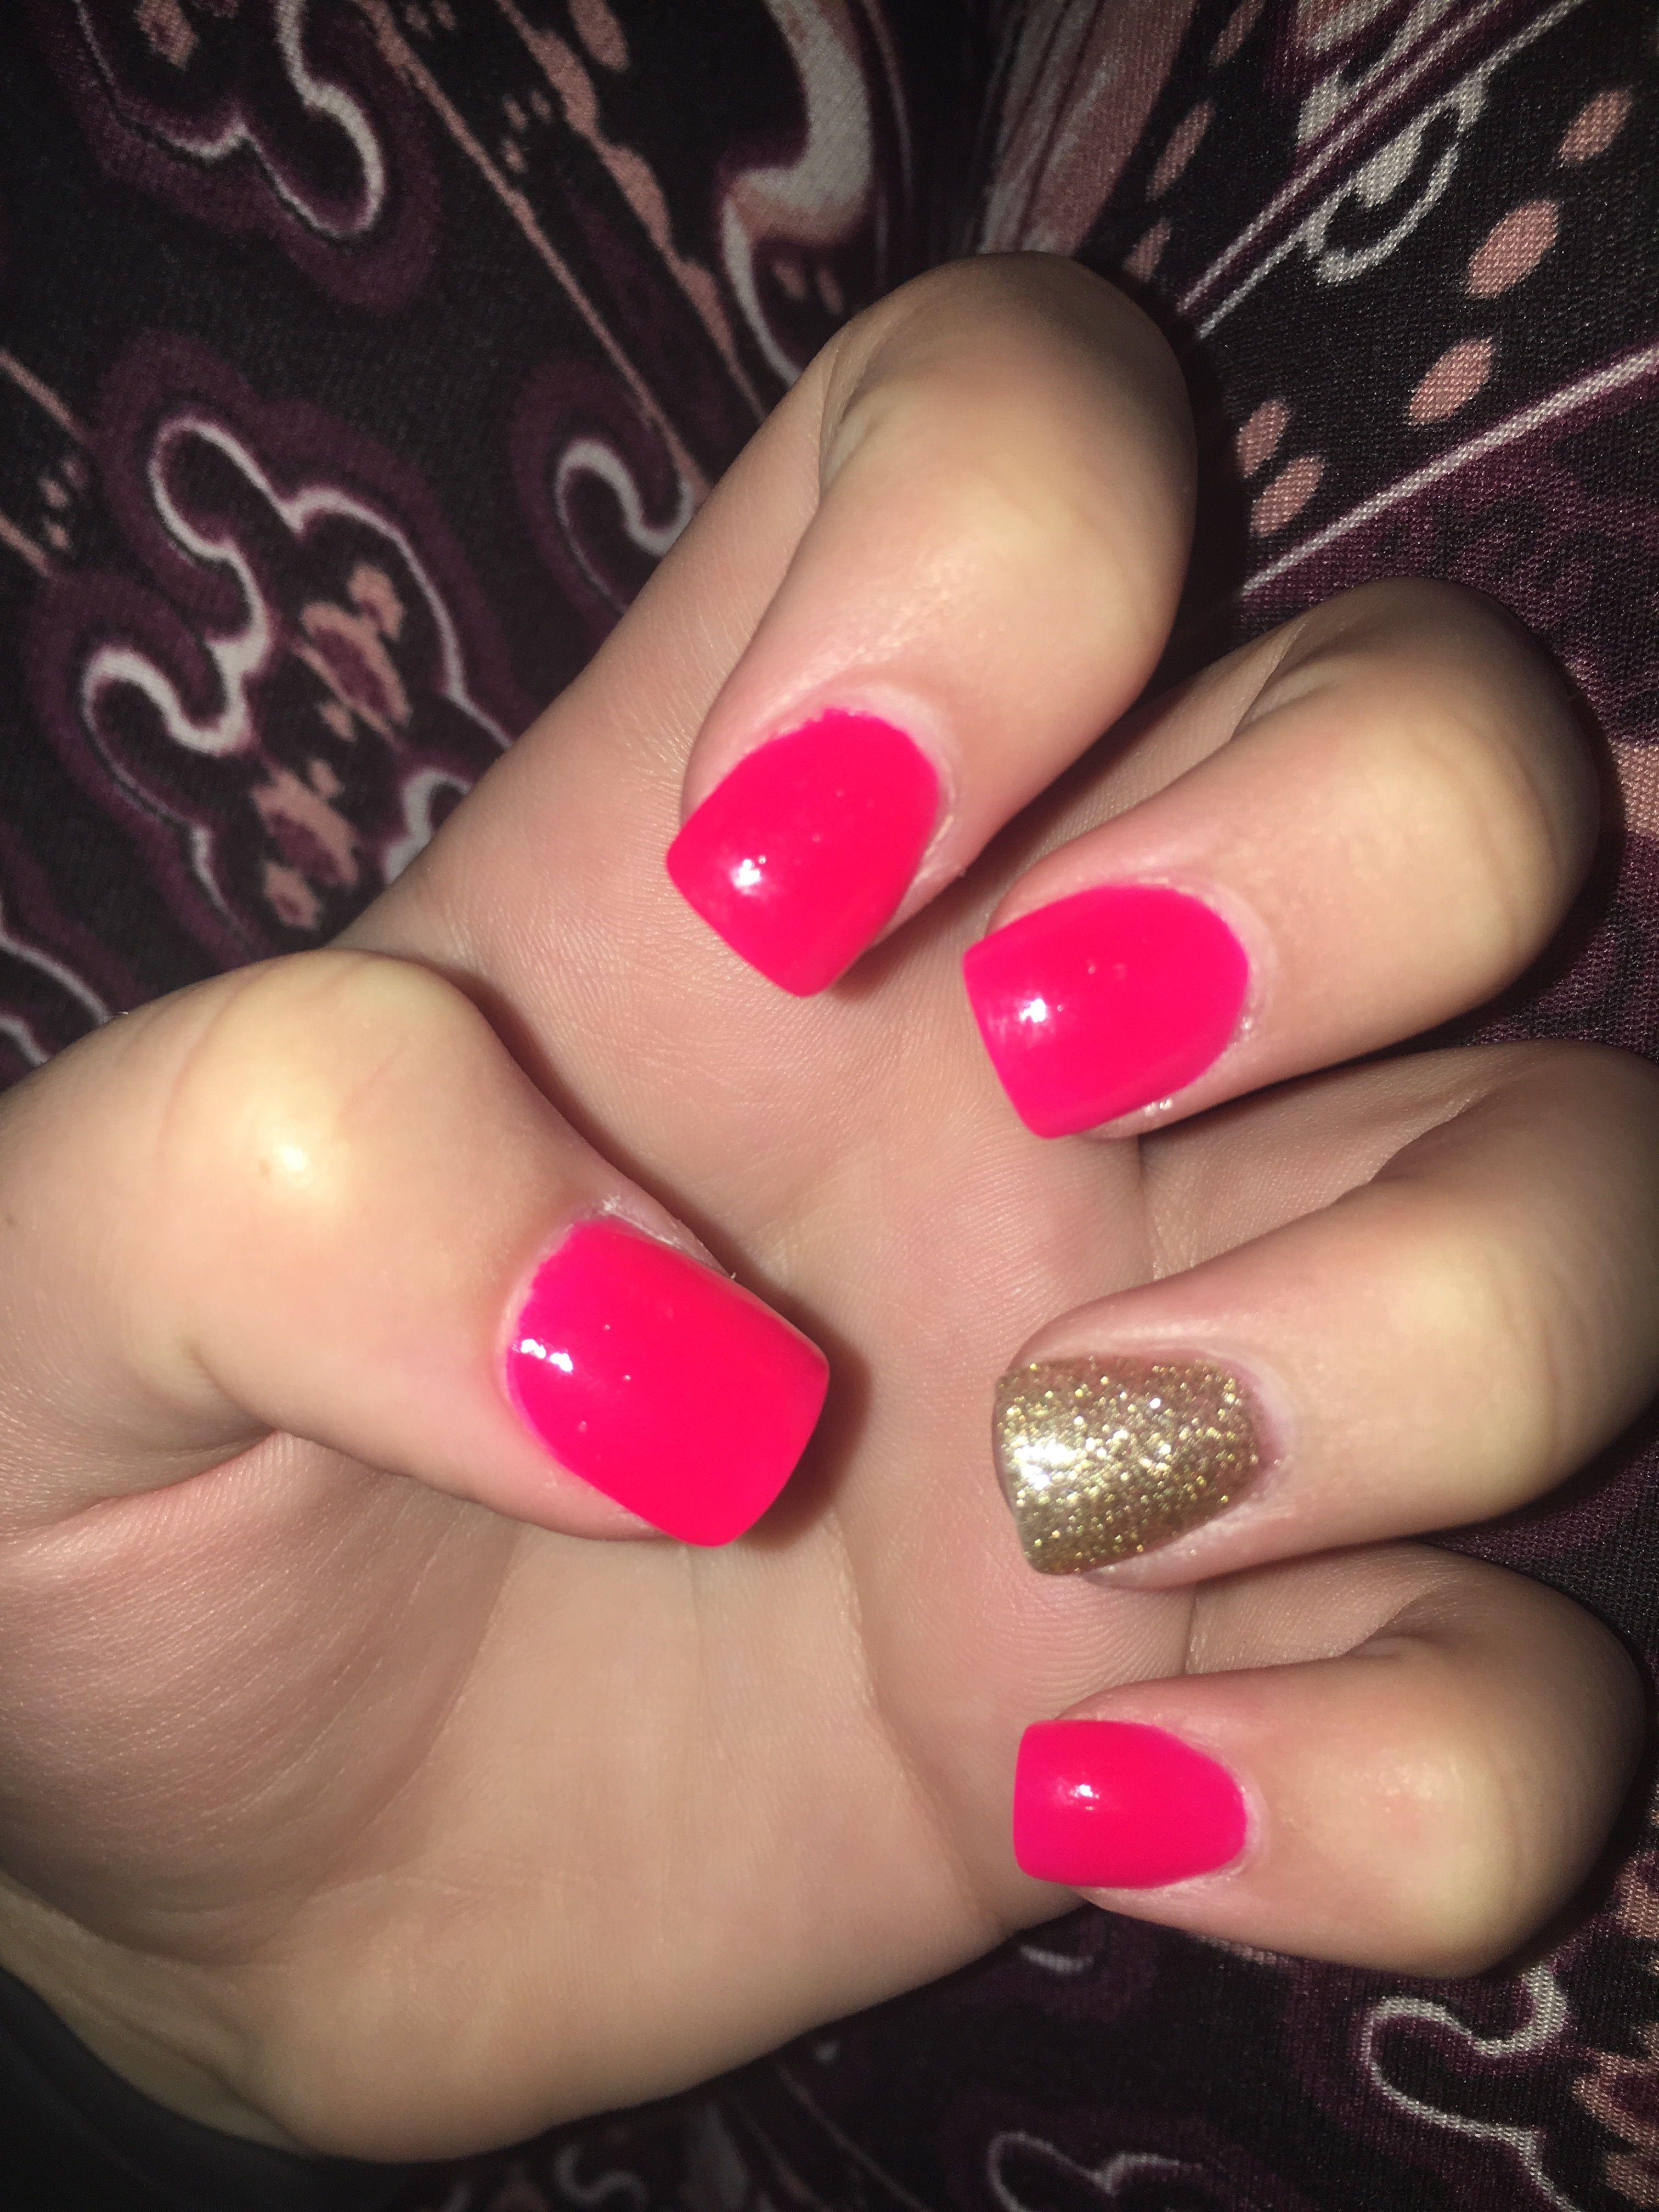 Love my new nails Short acrylic hot pink and gold | Acrylic nails ...